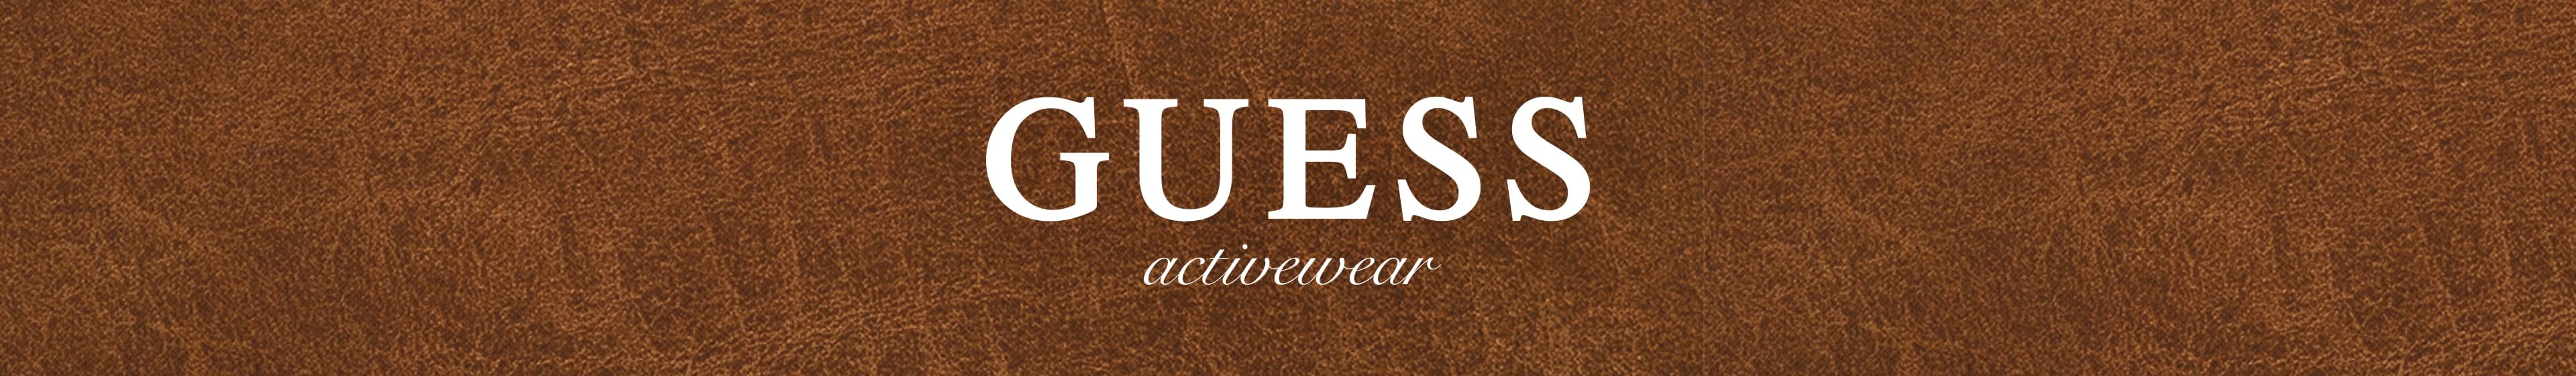 Activewear for women and men